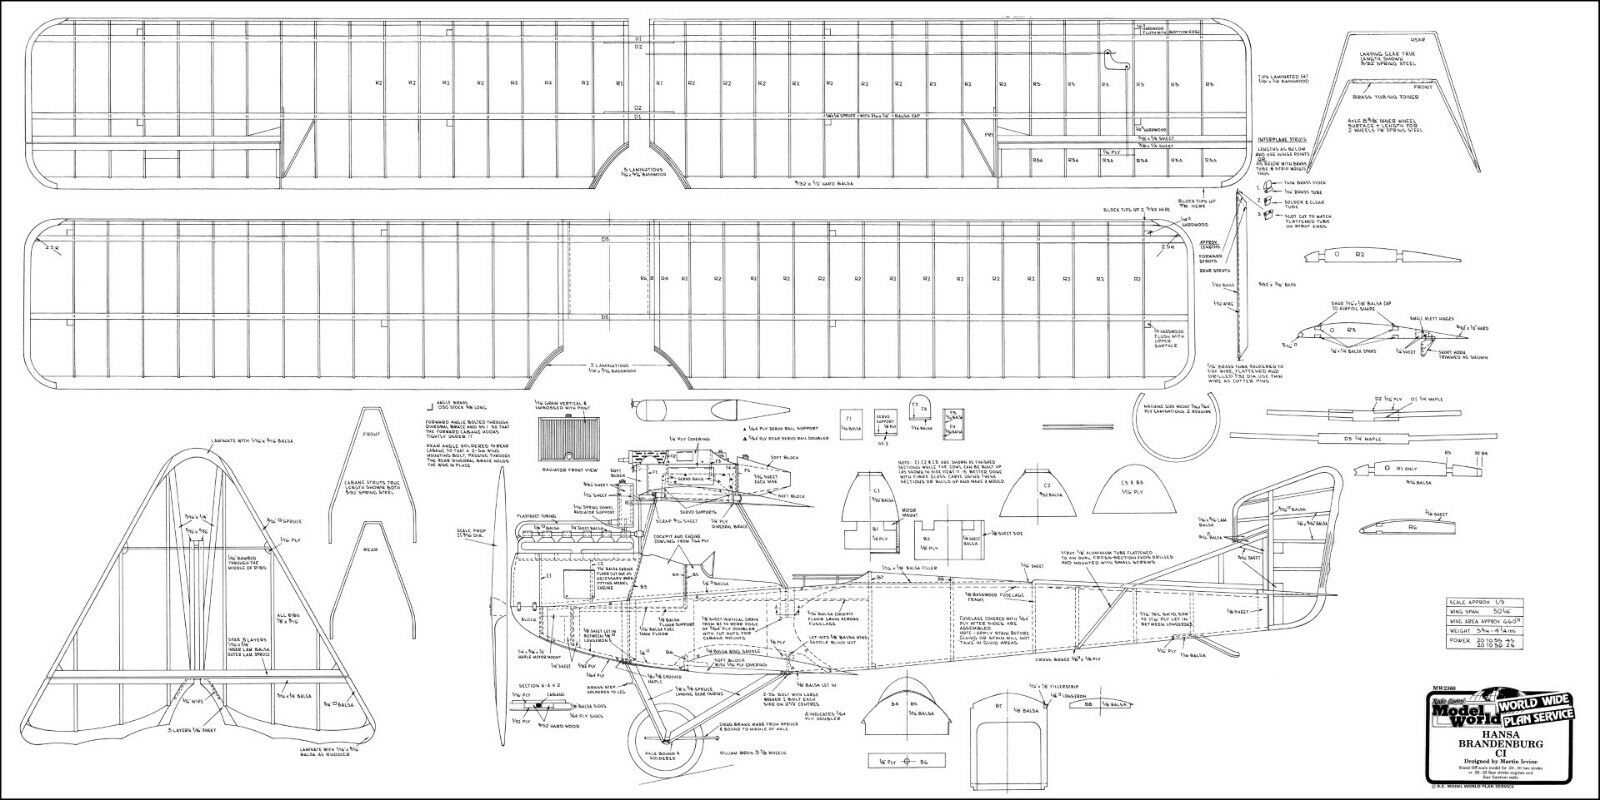 HANSA BRANDENBURG CJ, CJ, CJ, Erkundungsflugzeug. Modellbauplan fbb3de